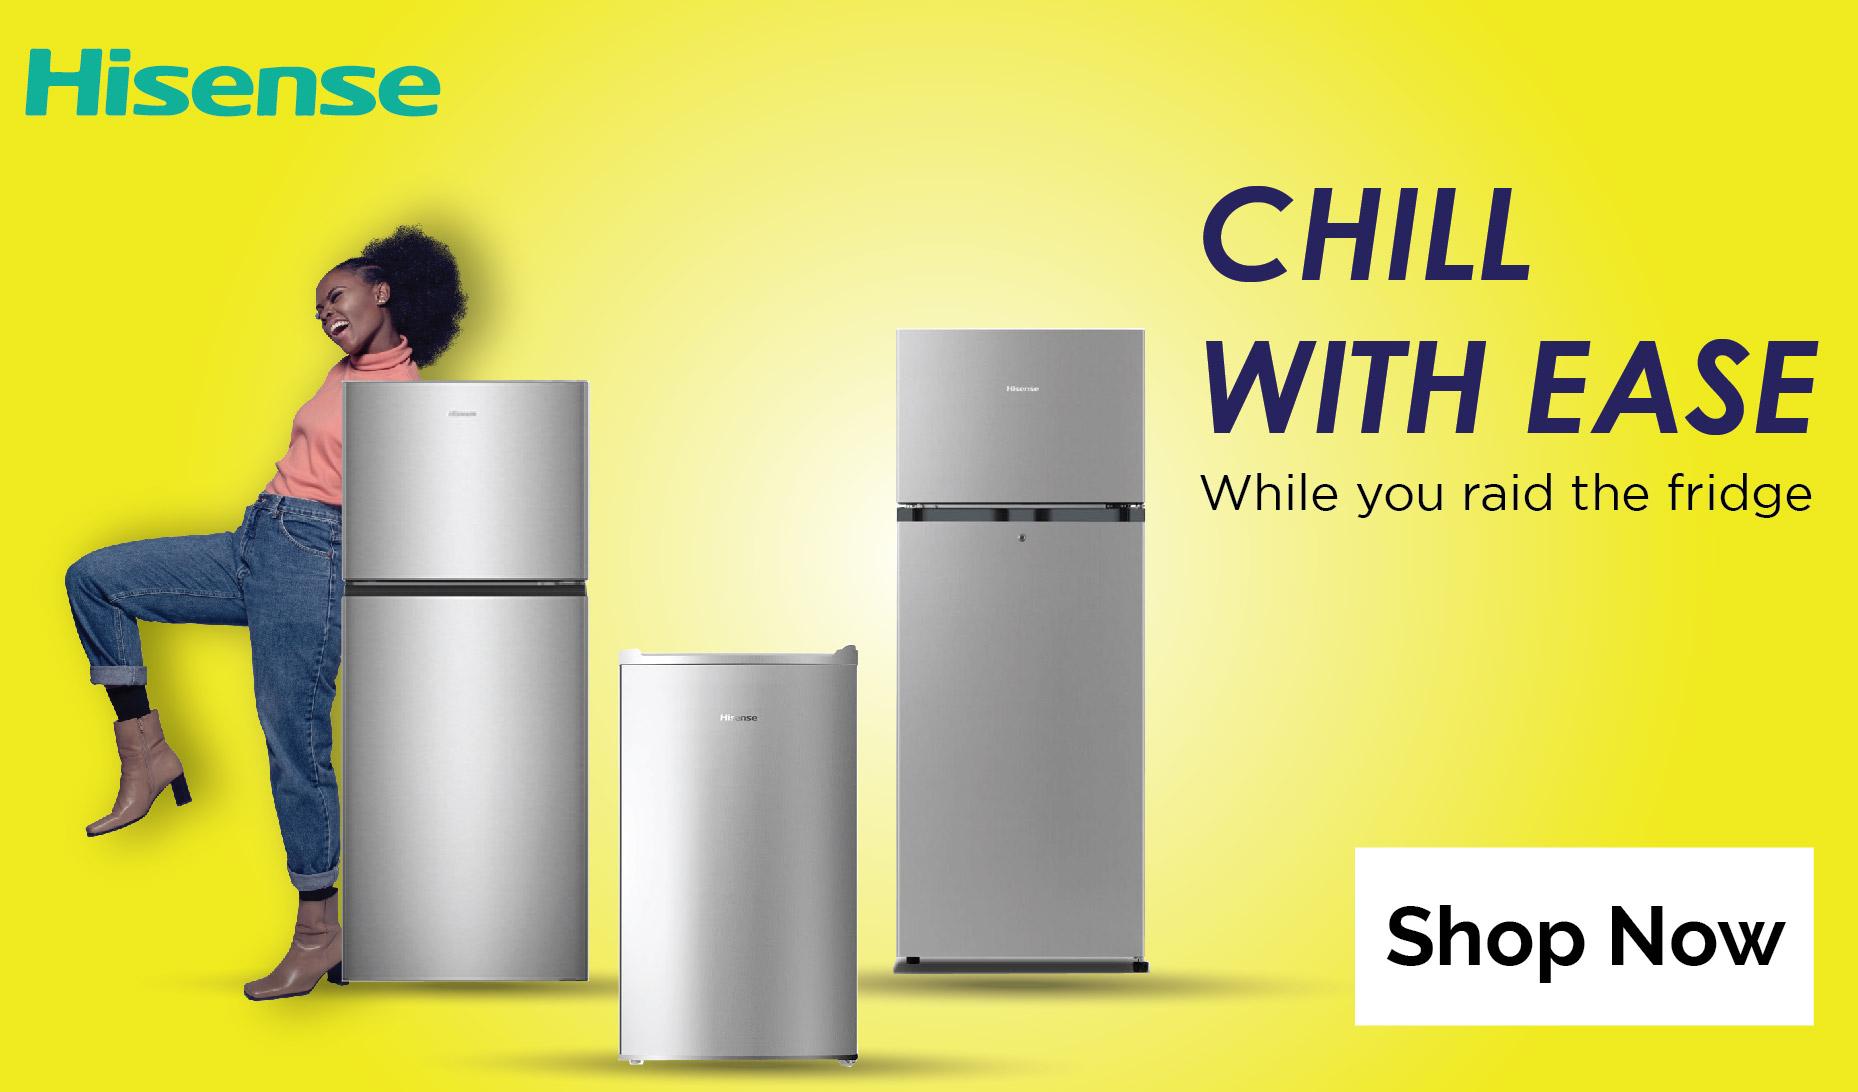 Hisense Rrefrigerators